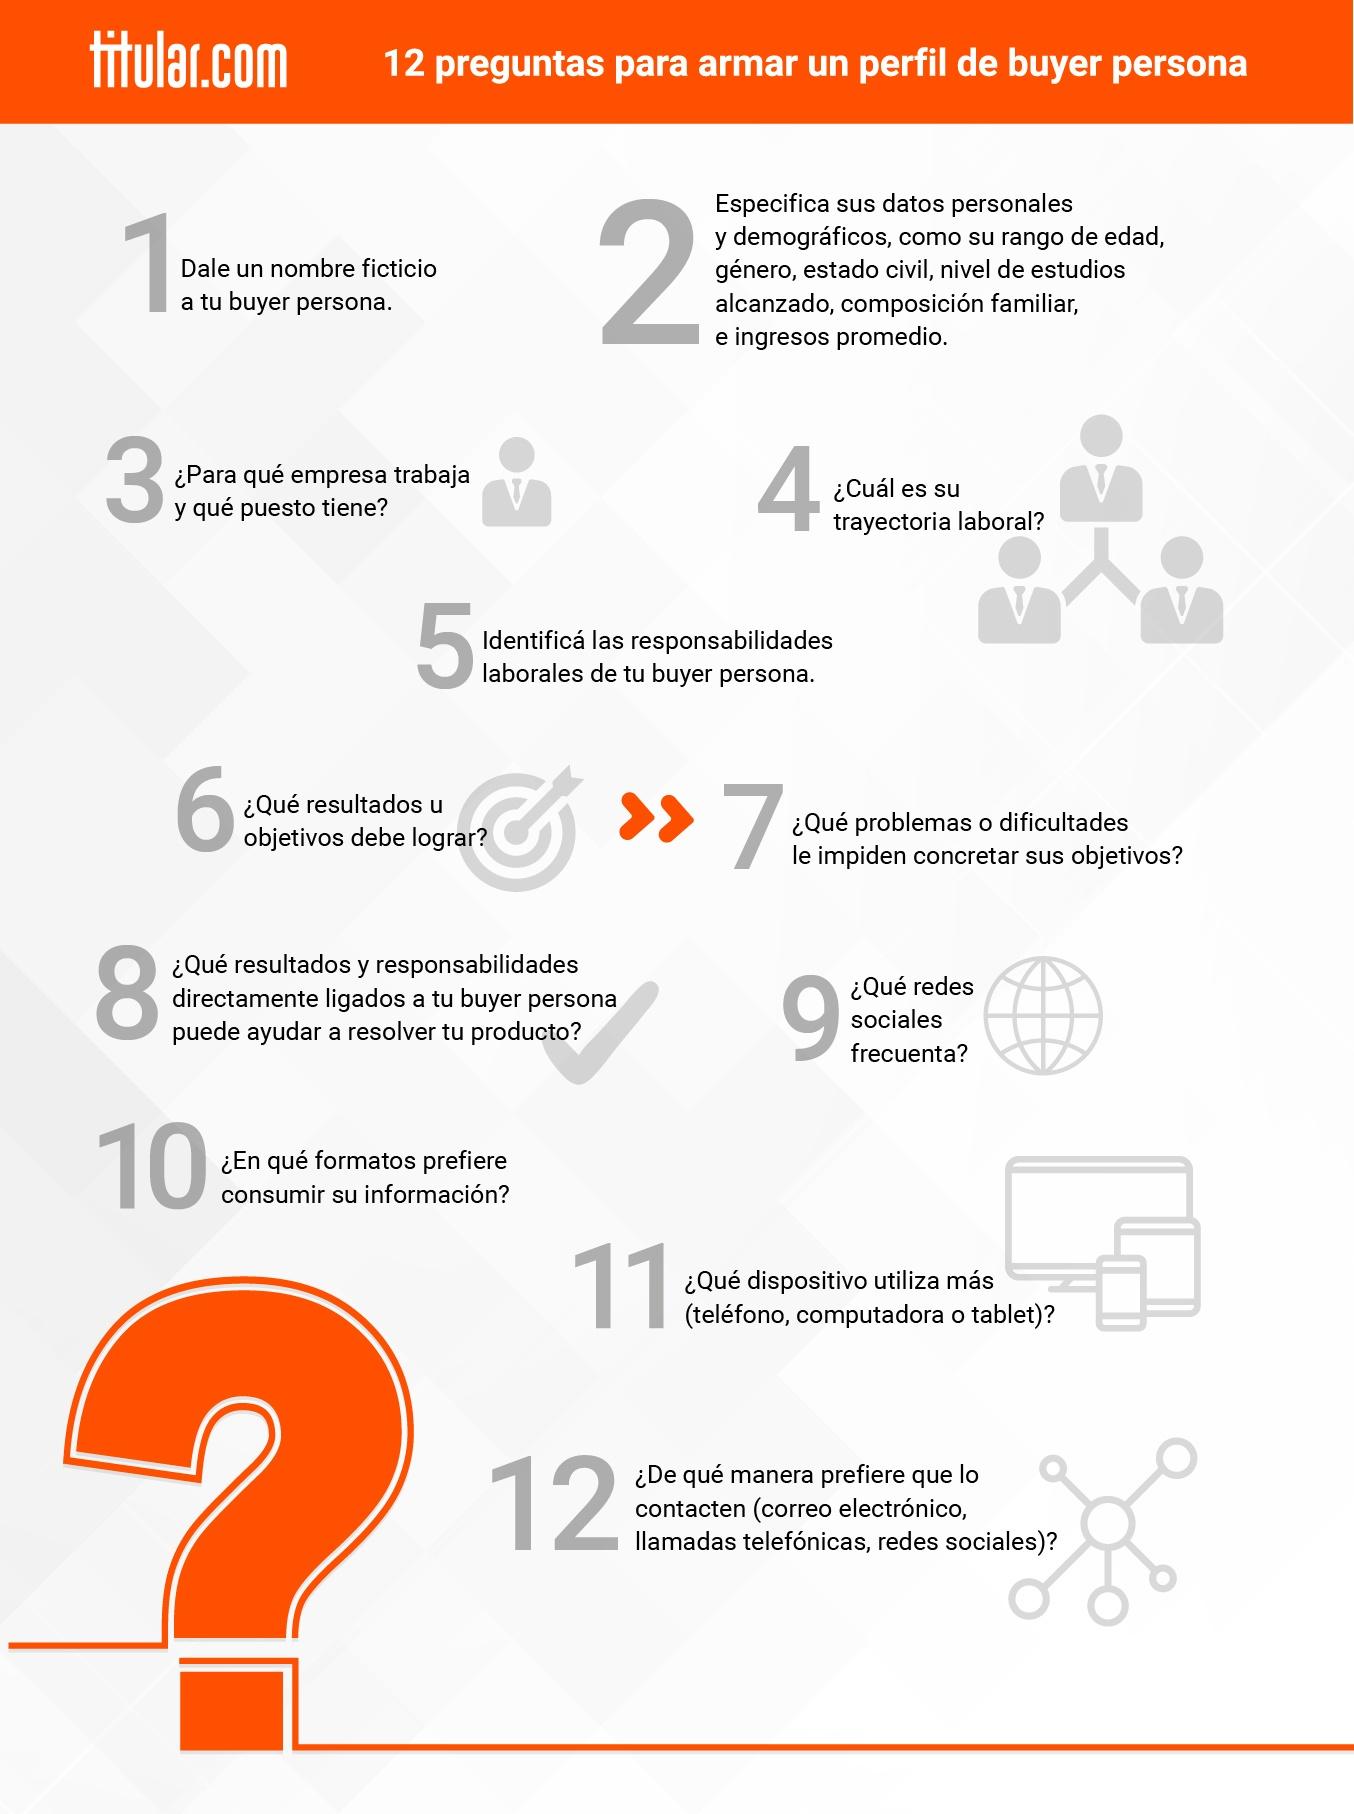 Infografia-12preguntas